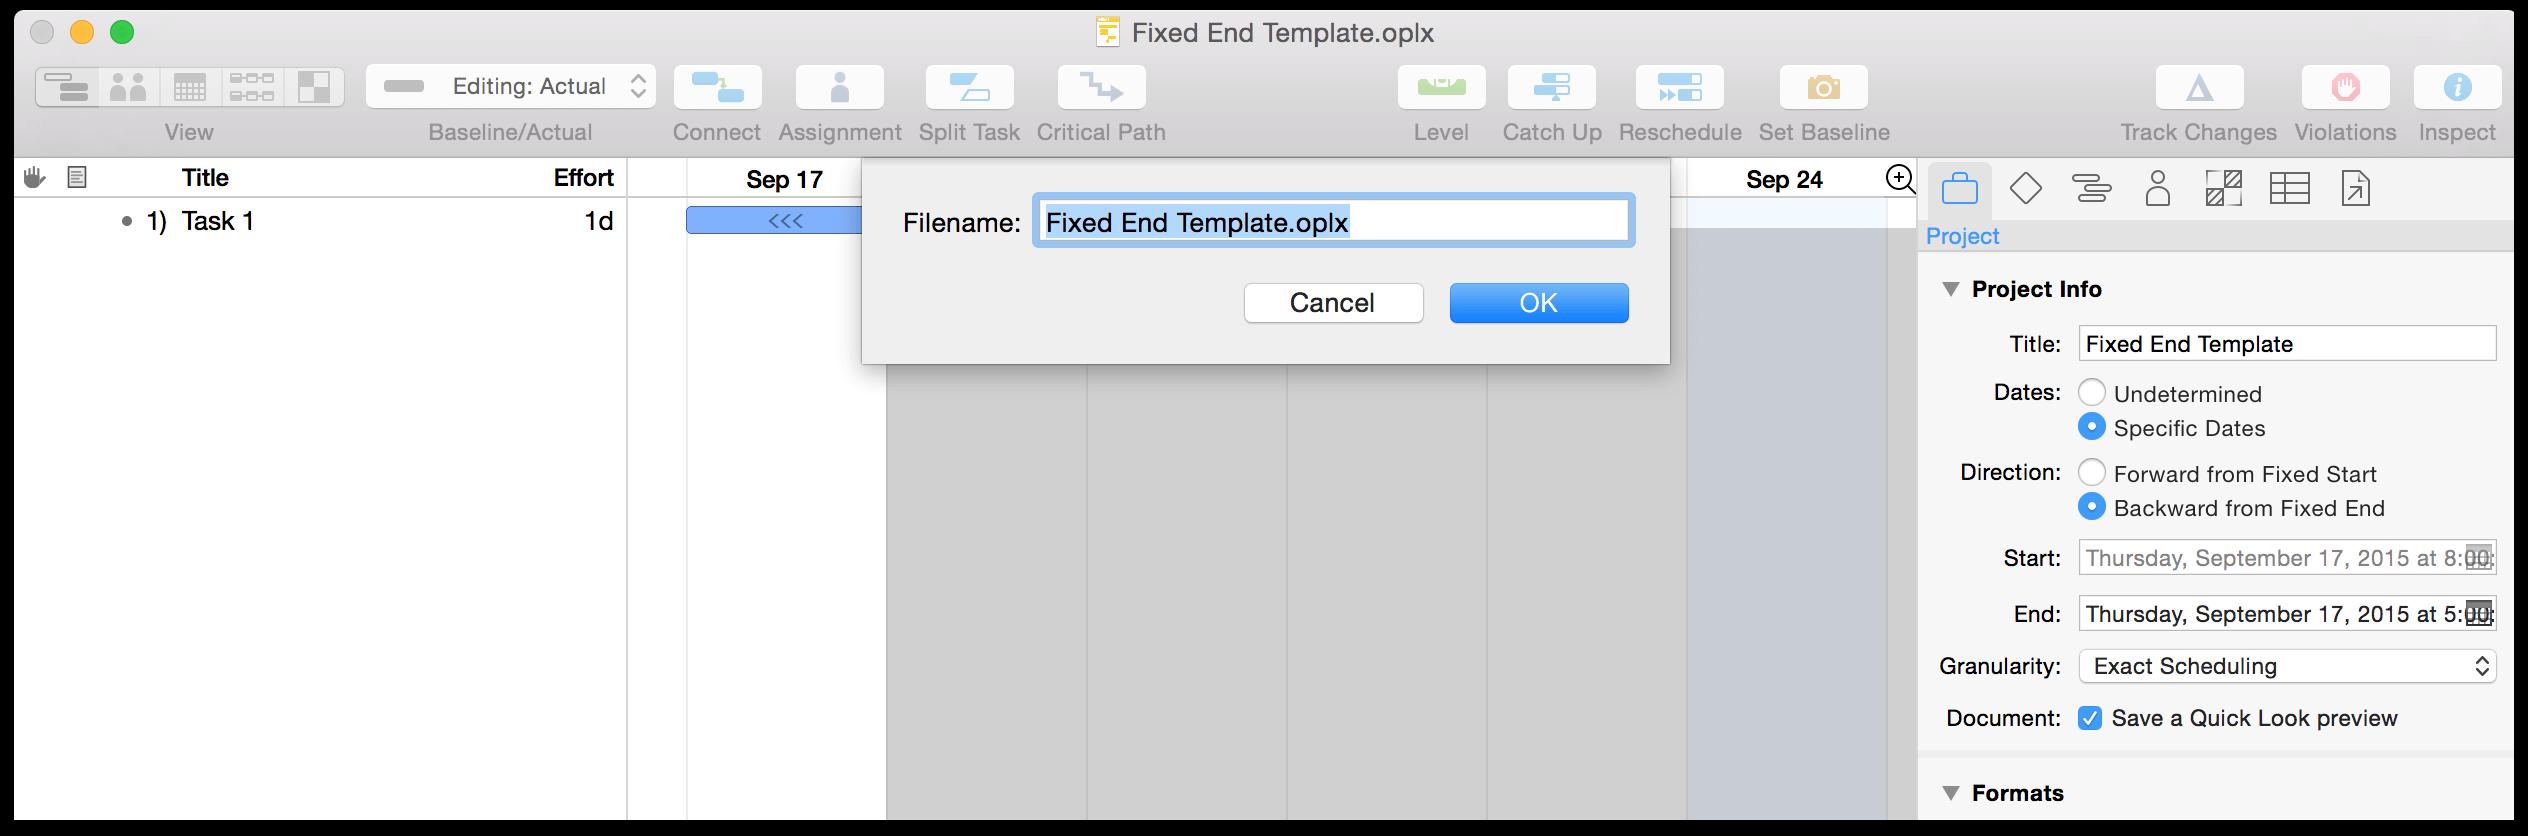 OmniPlan 3 for Mac User Manual - OmniPlan Preferences